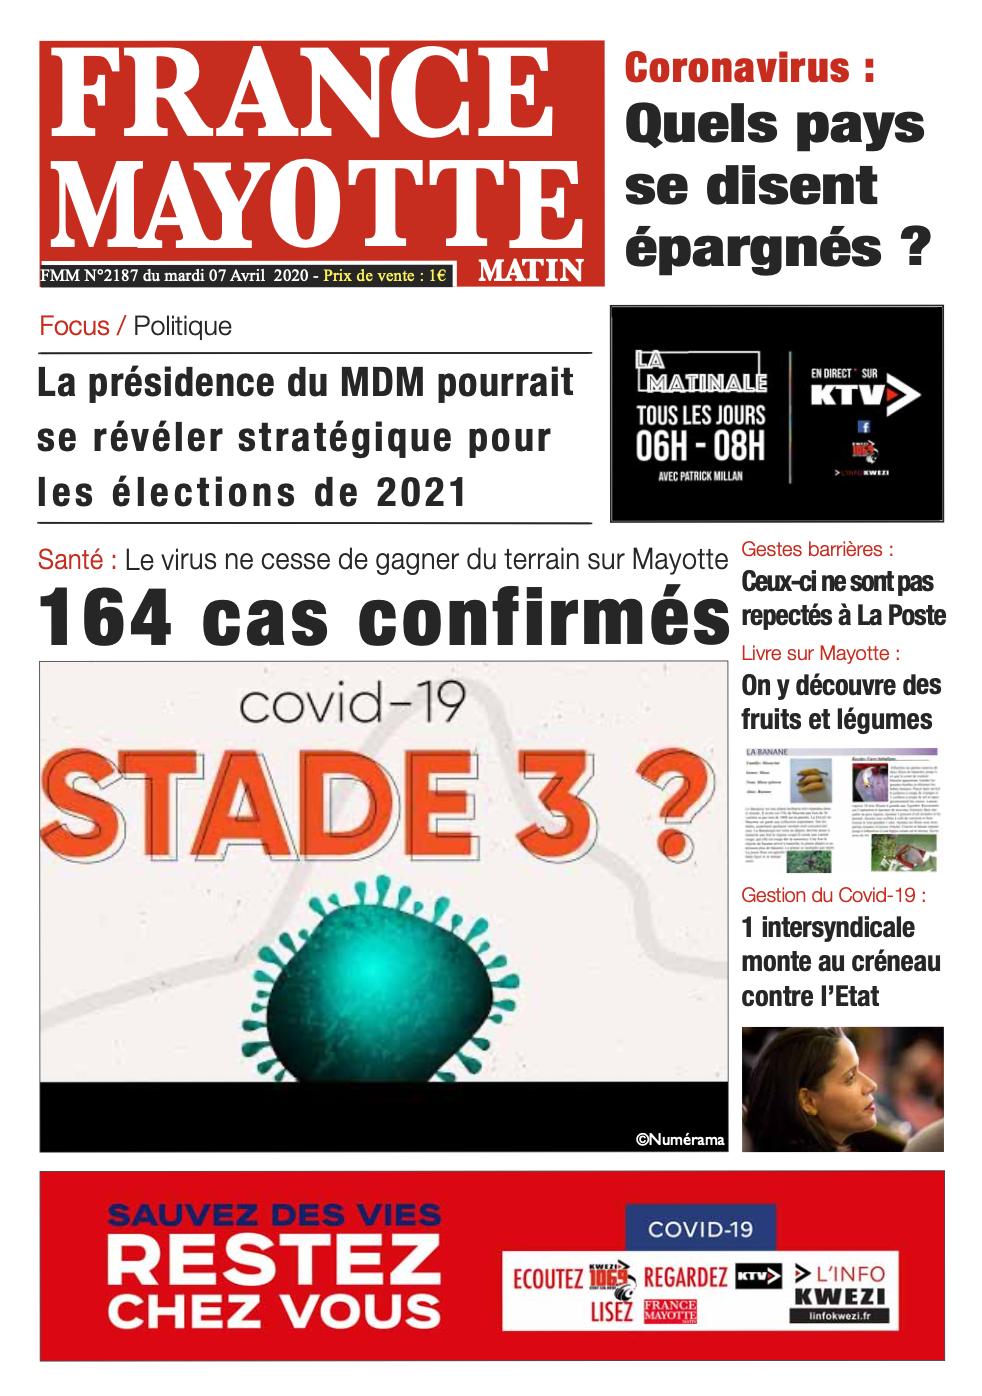 France Mayotte Mardi 7 avril 2020